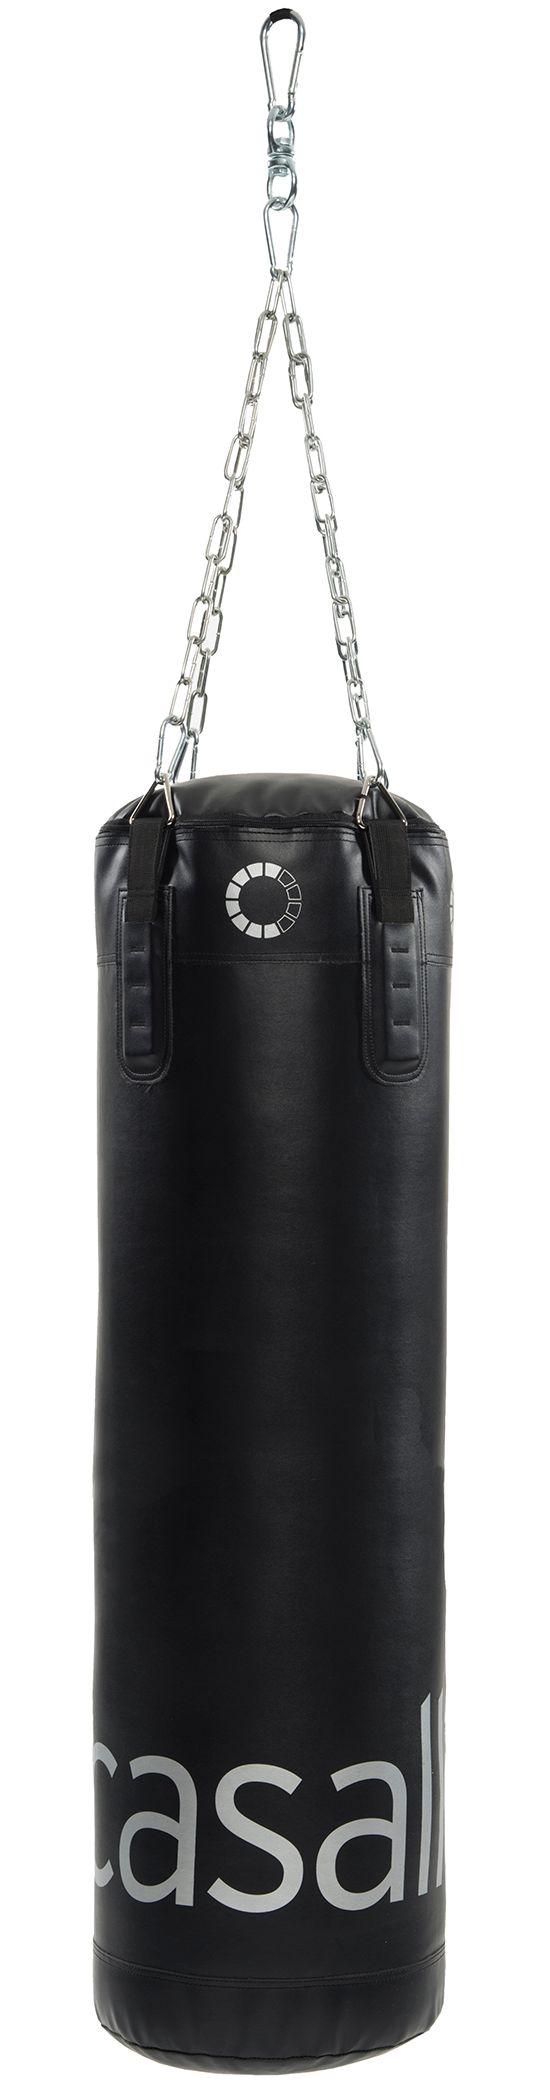 Boxing bag 130 cm